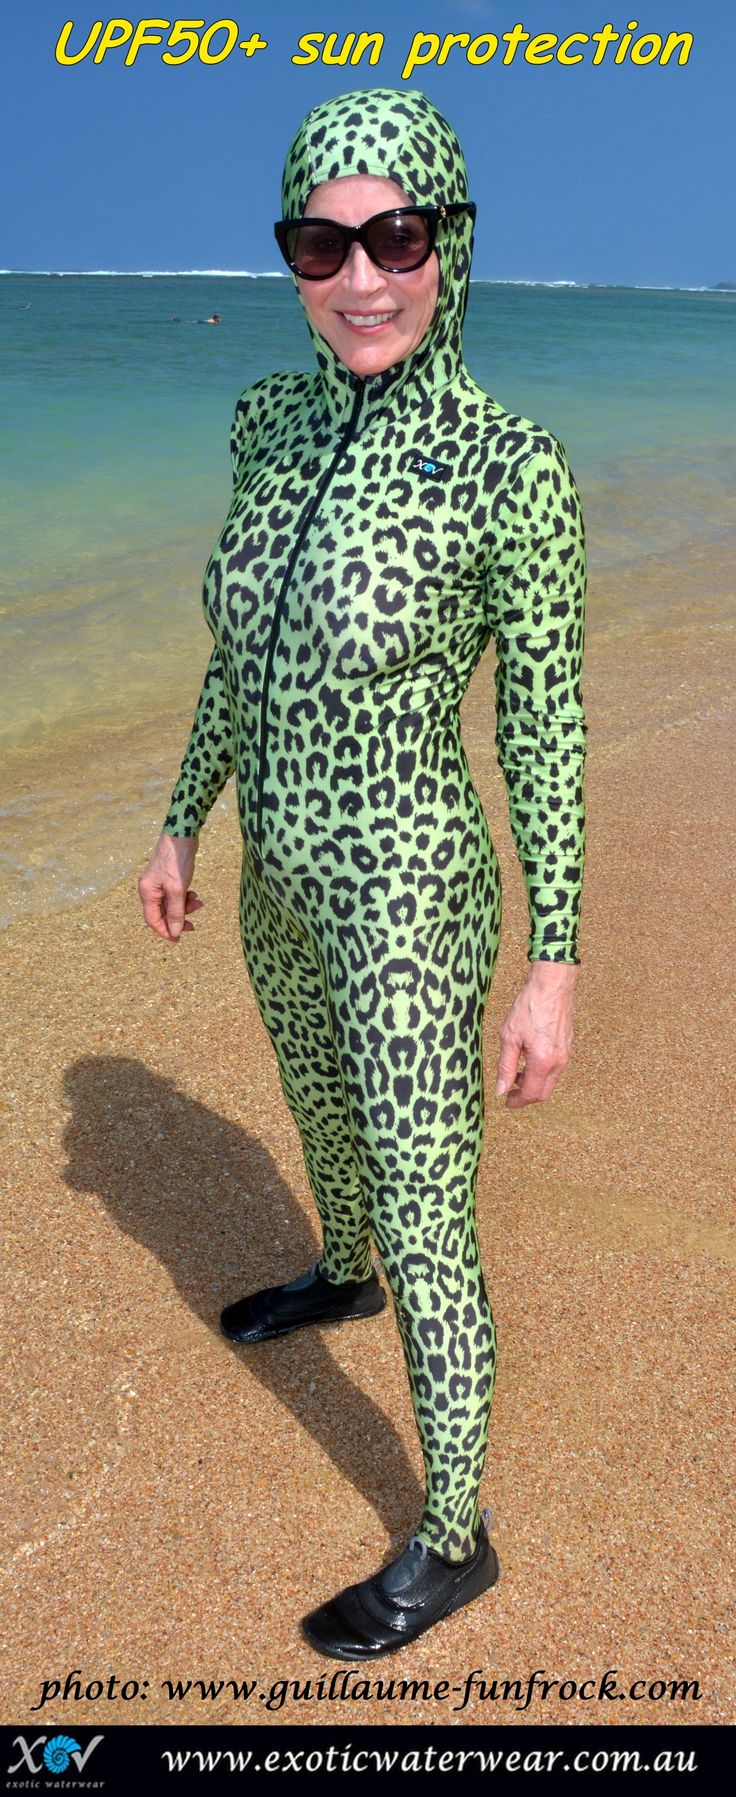 Melanoma survivor still enjoys the sun in style! www.exoticwaterwear.com.au #stingersuit